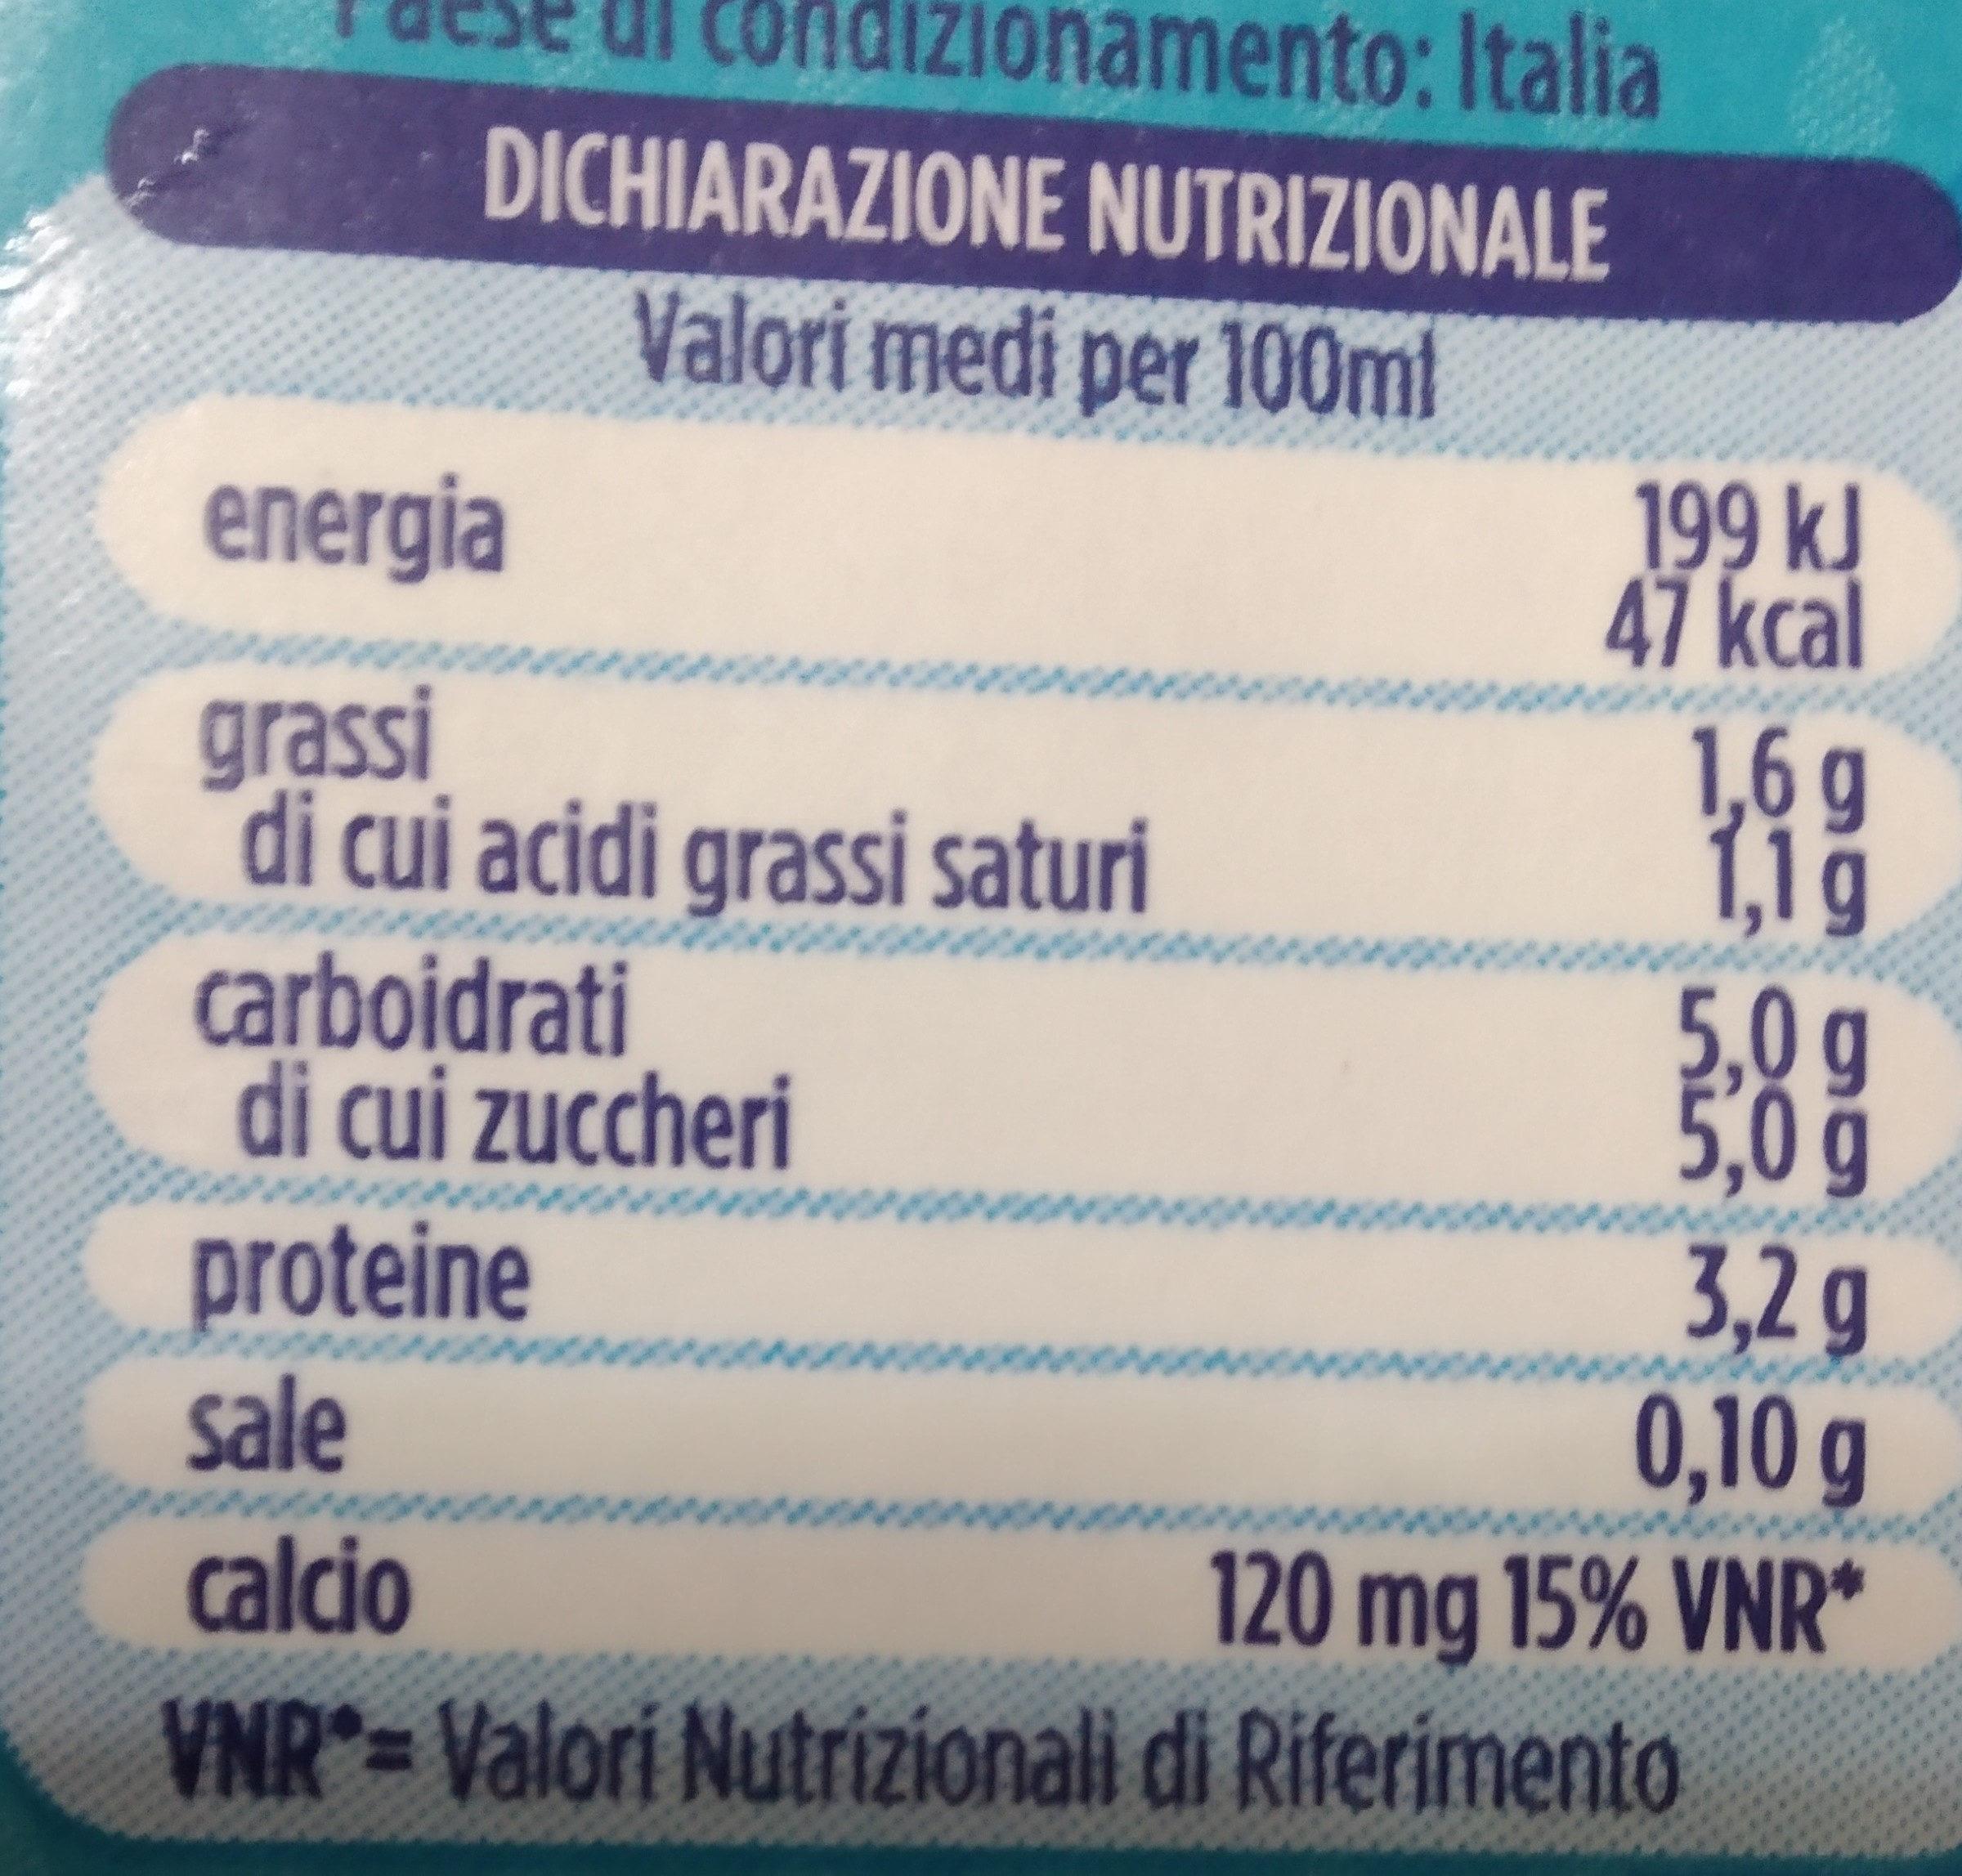 Granarolo bontà leggera latte parzialmente scremato - Voedingswaarden - it